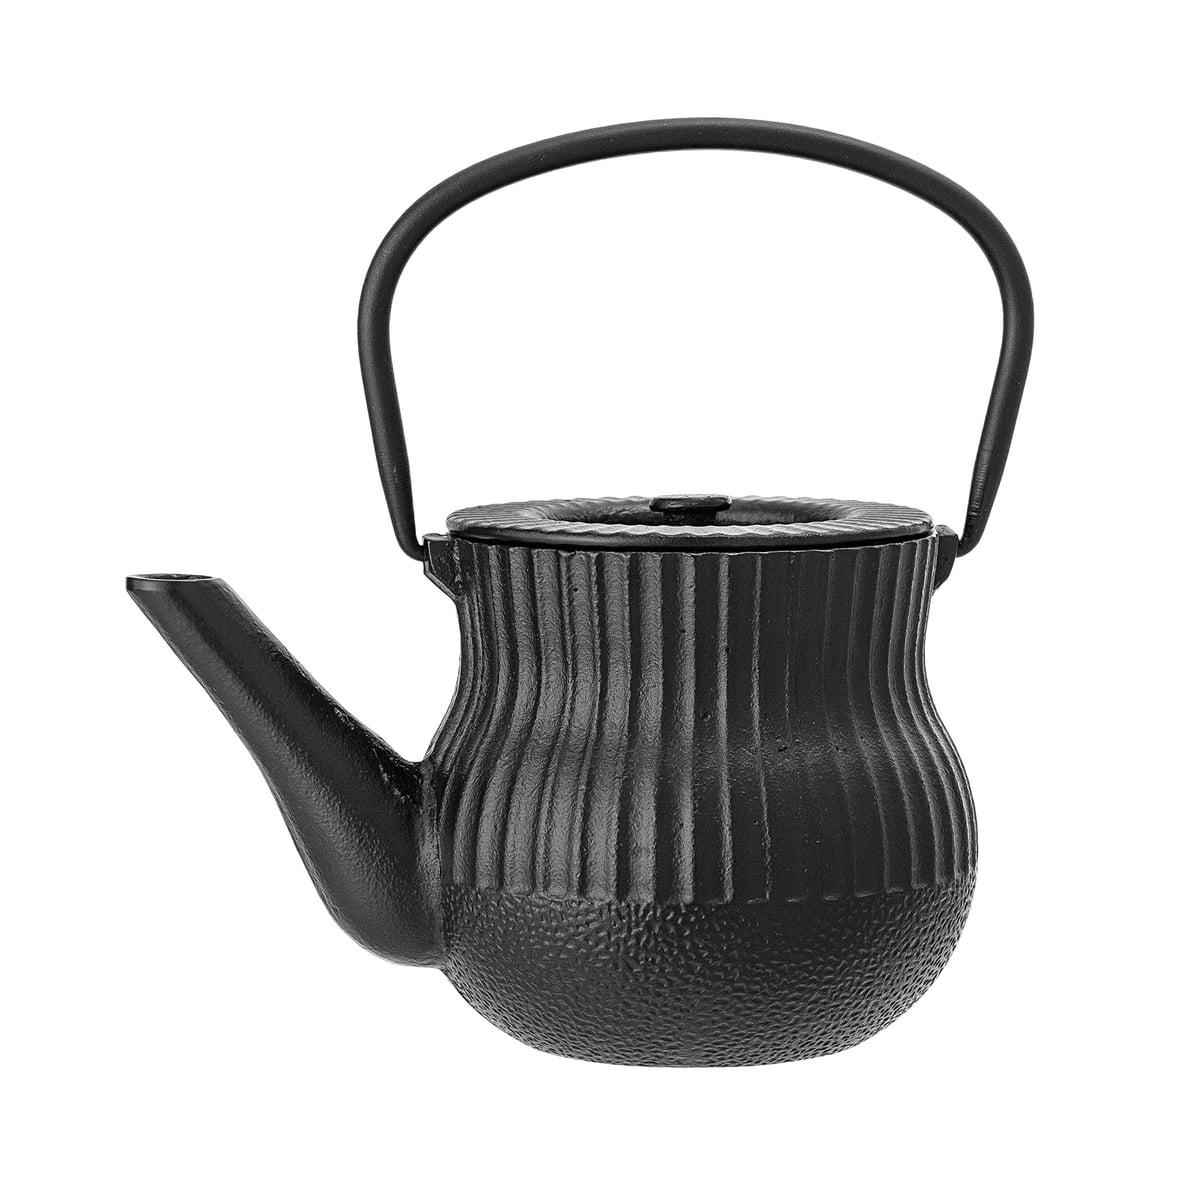 Bloomingville - Teekanne, Ø 13 x H 12 cm, schwarz